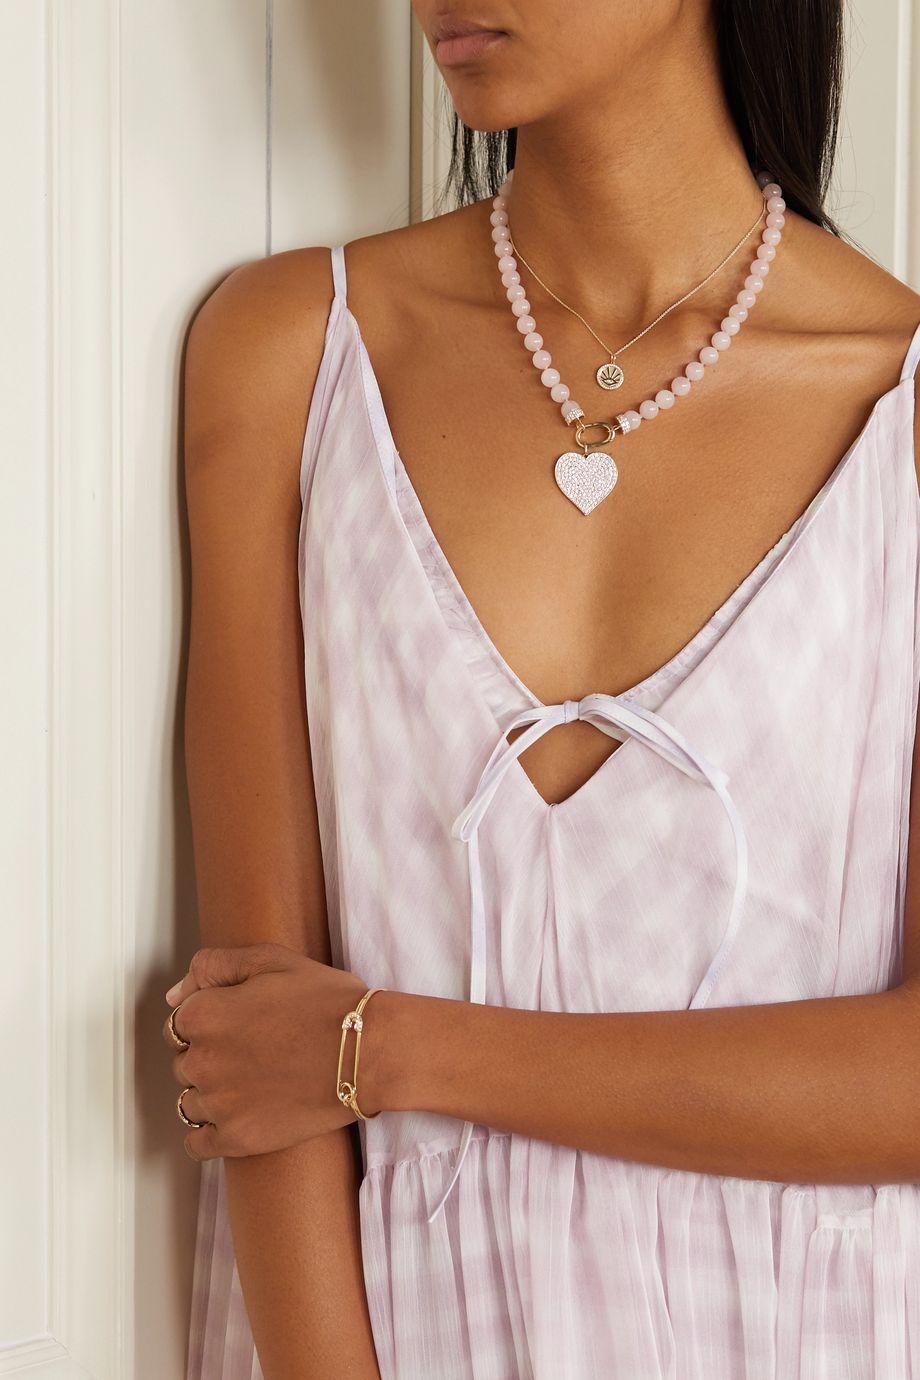 Sydney Evan 14-karat gold, diamond and quartz necklace